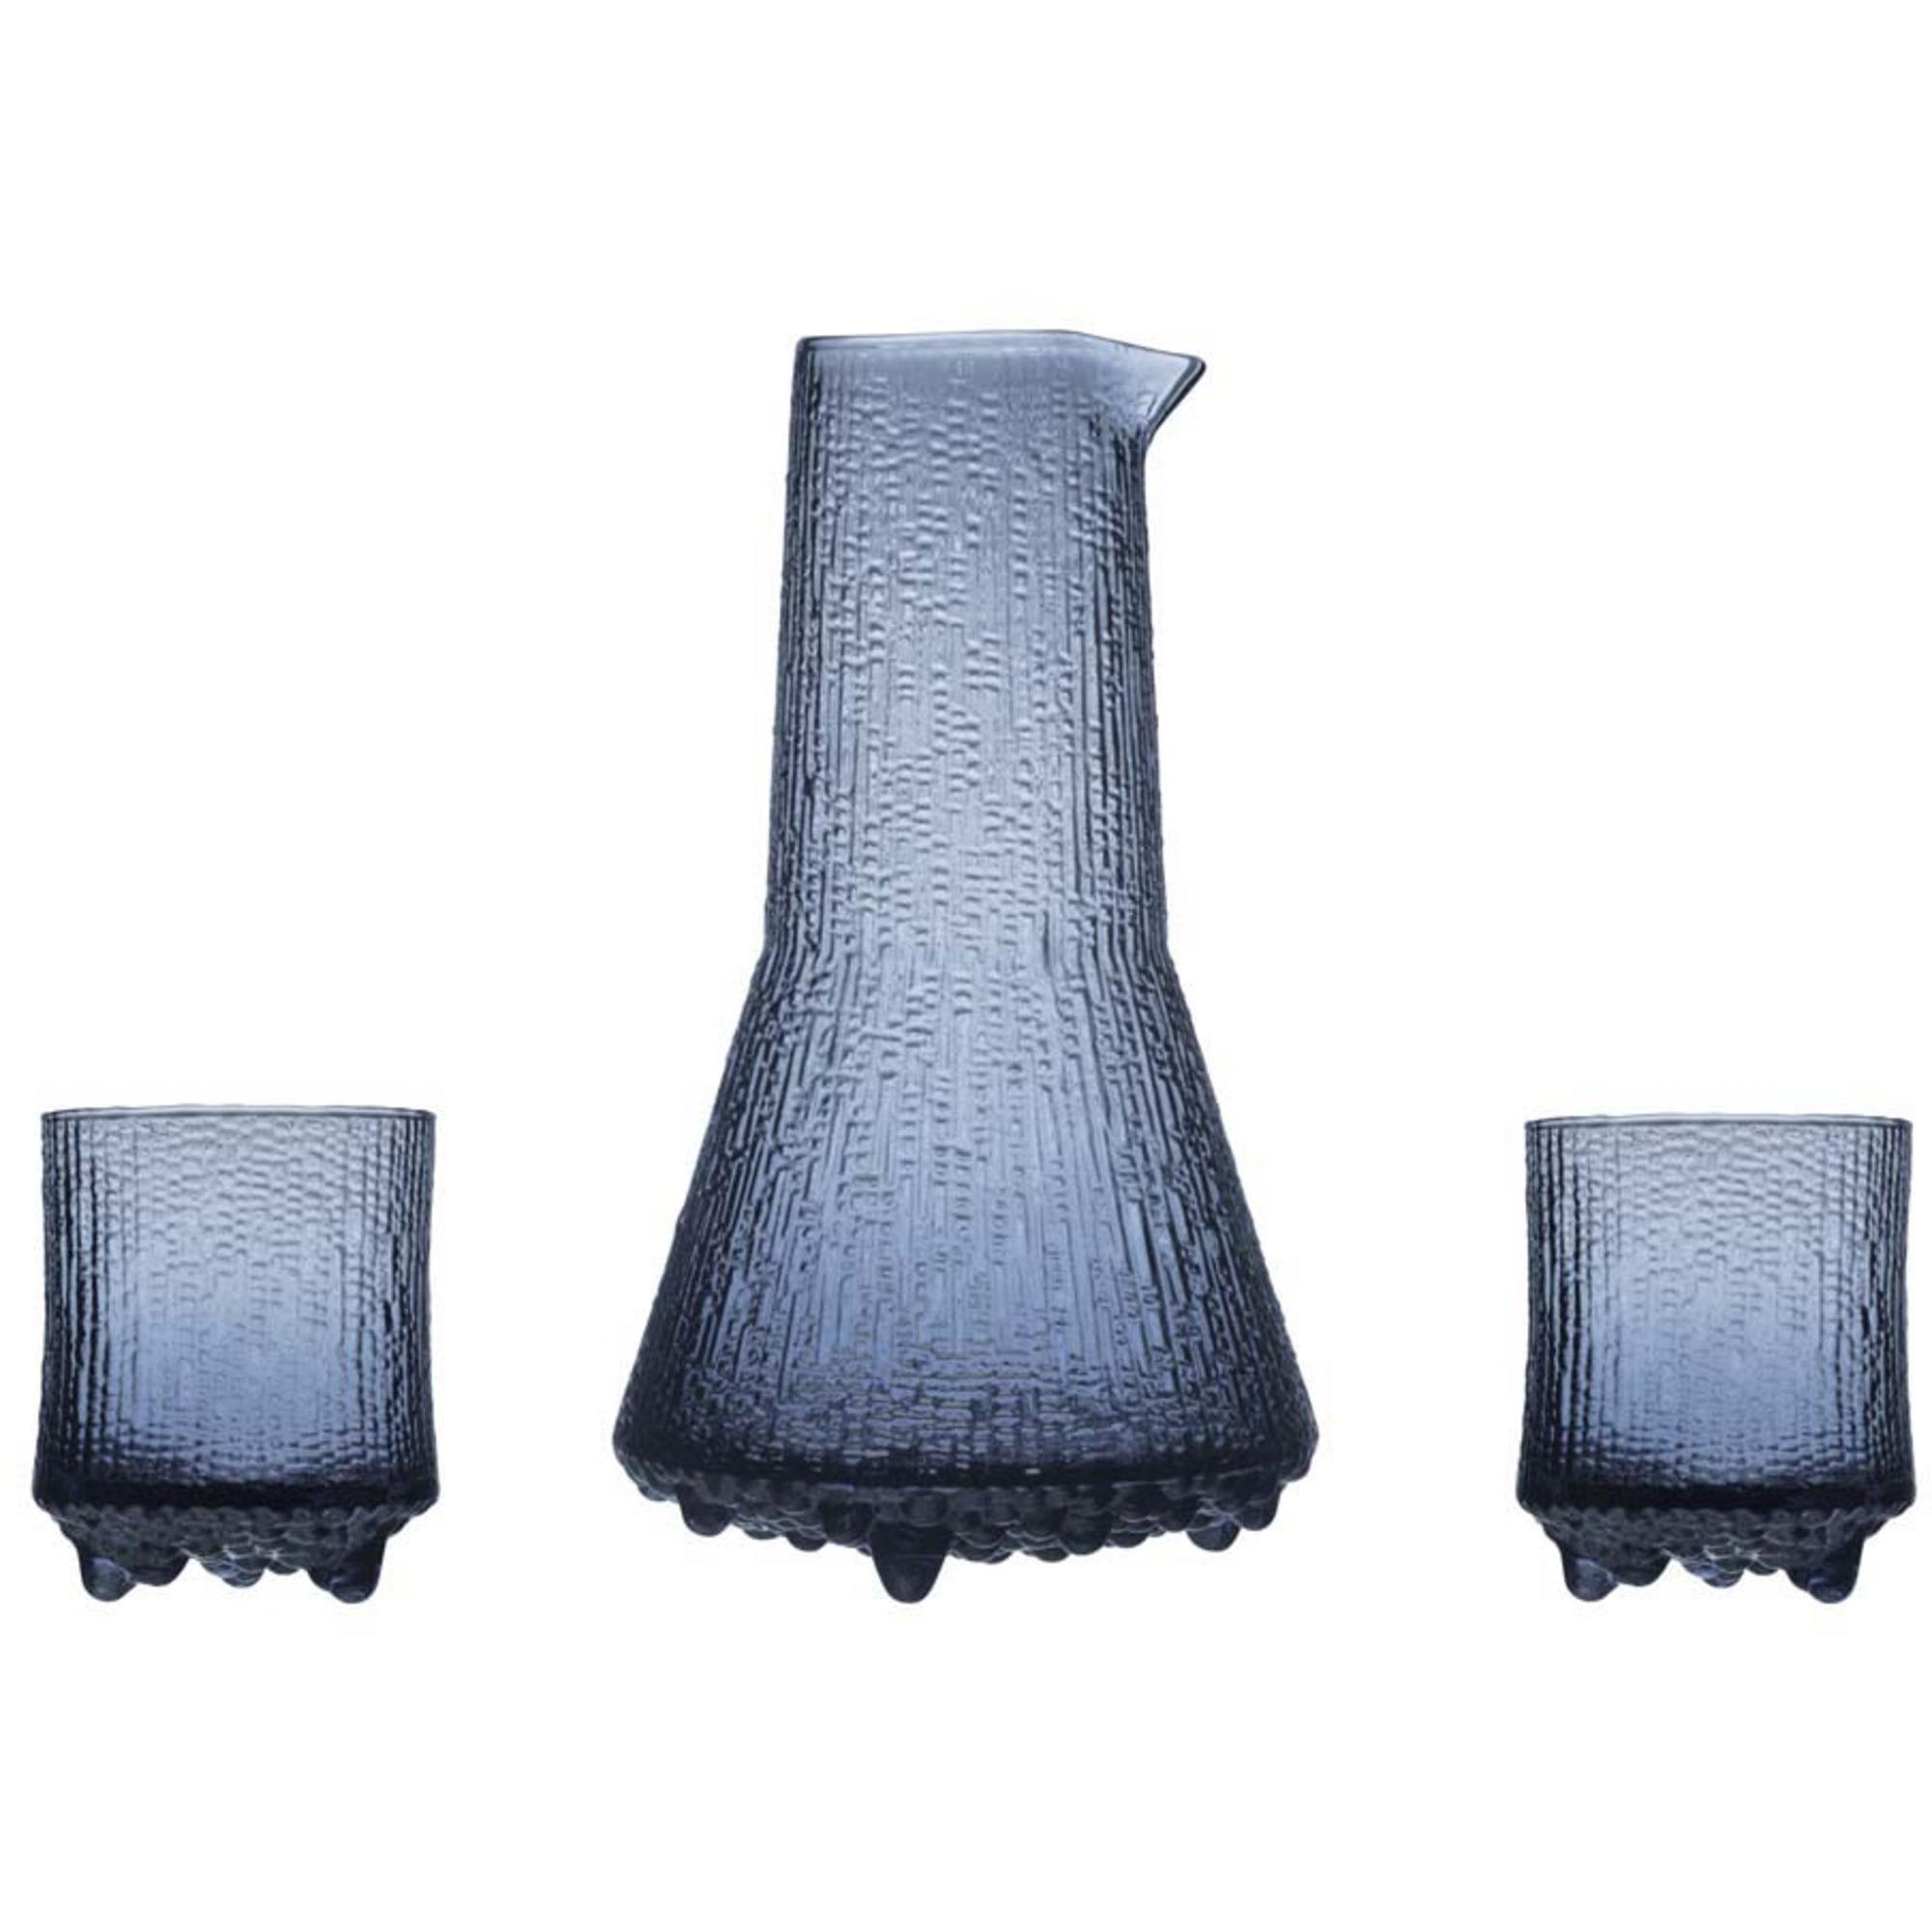 Iittala Ultima Thule glas 20 cl+kanna 50 cl regn 3 st